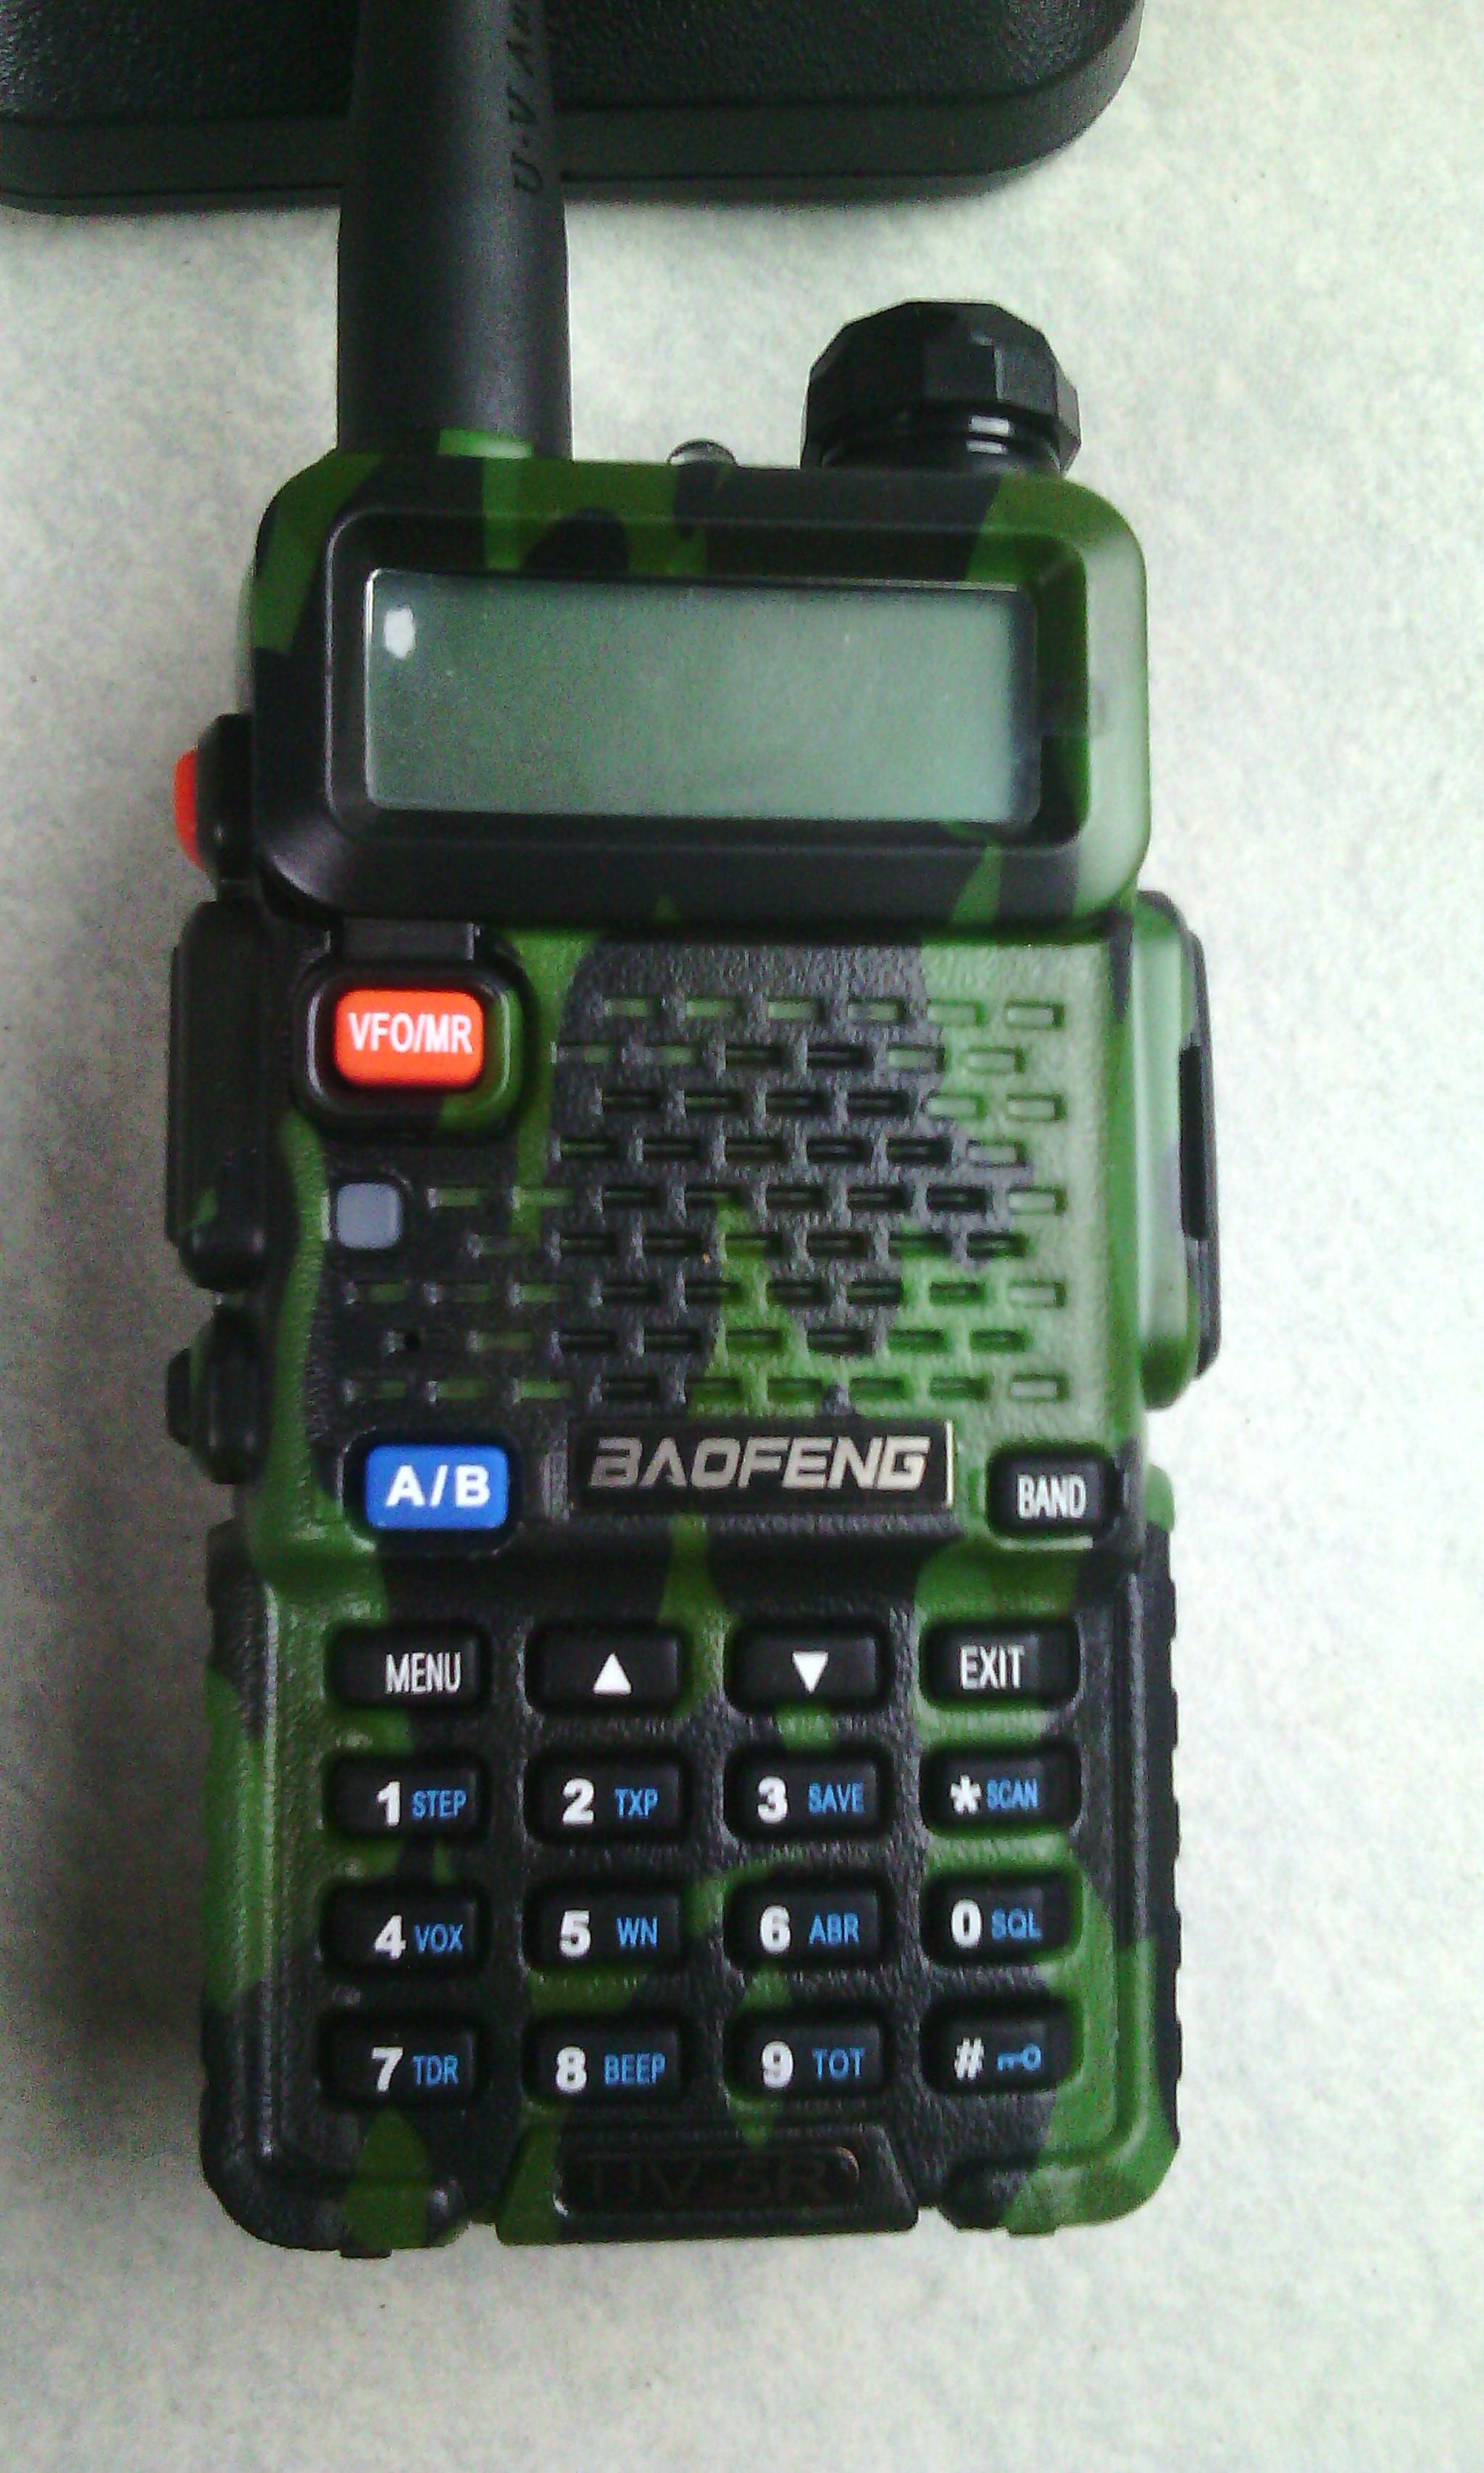 Baofeng Uv 5ra Ht Walkie Talkie Resmi Indonesia Daftar Bf Uv5r Dual Band Uhf Vhf Handy Talky 5r Radio Handie Green Loreng